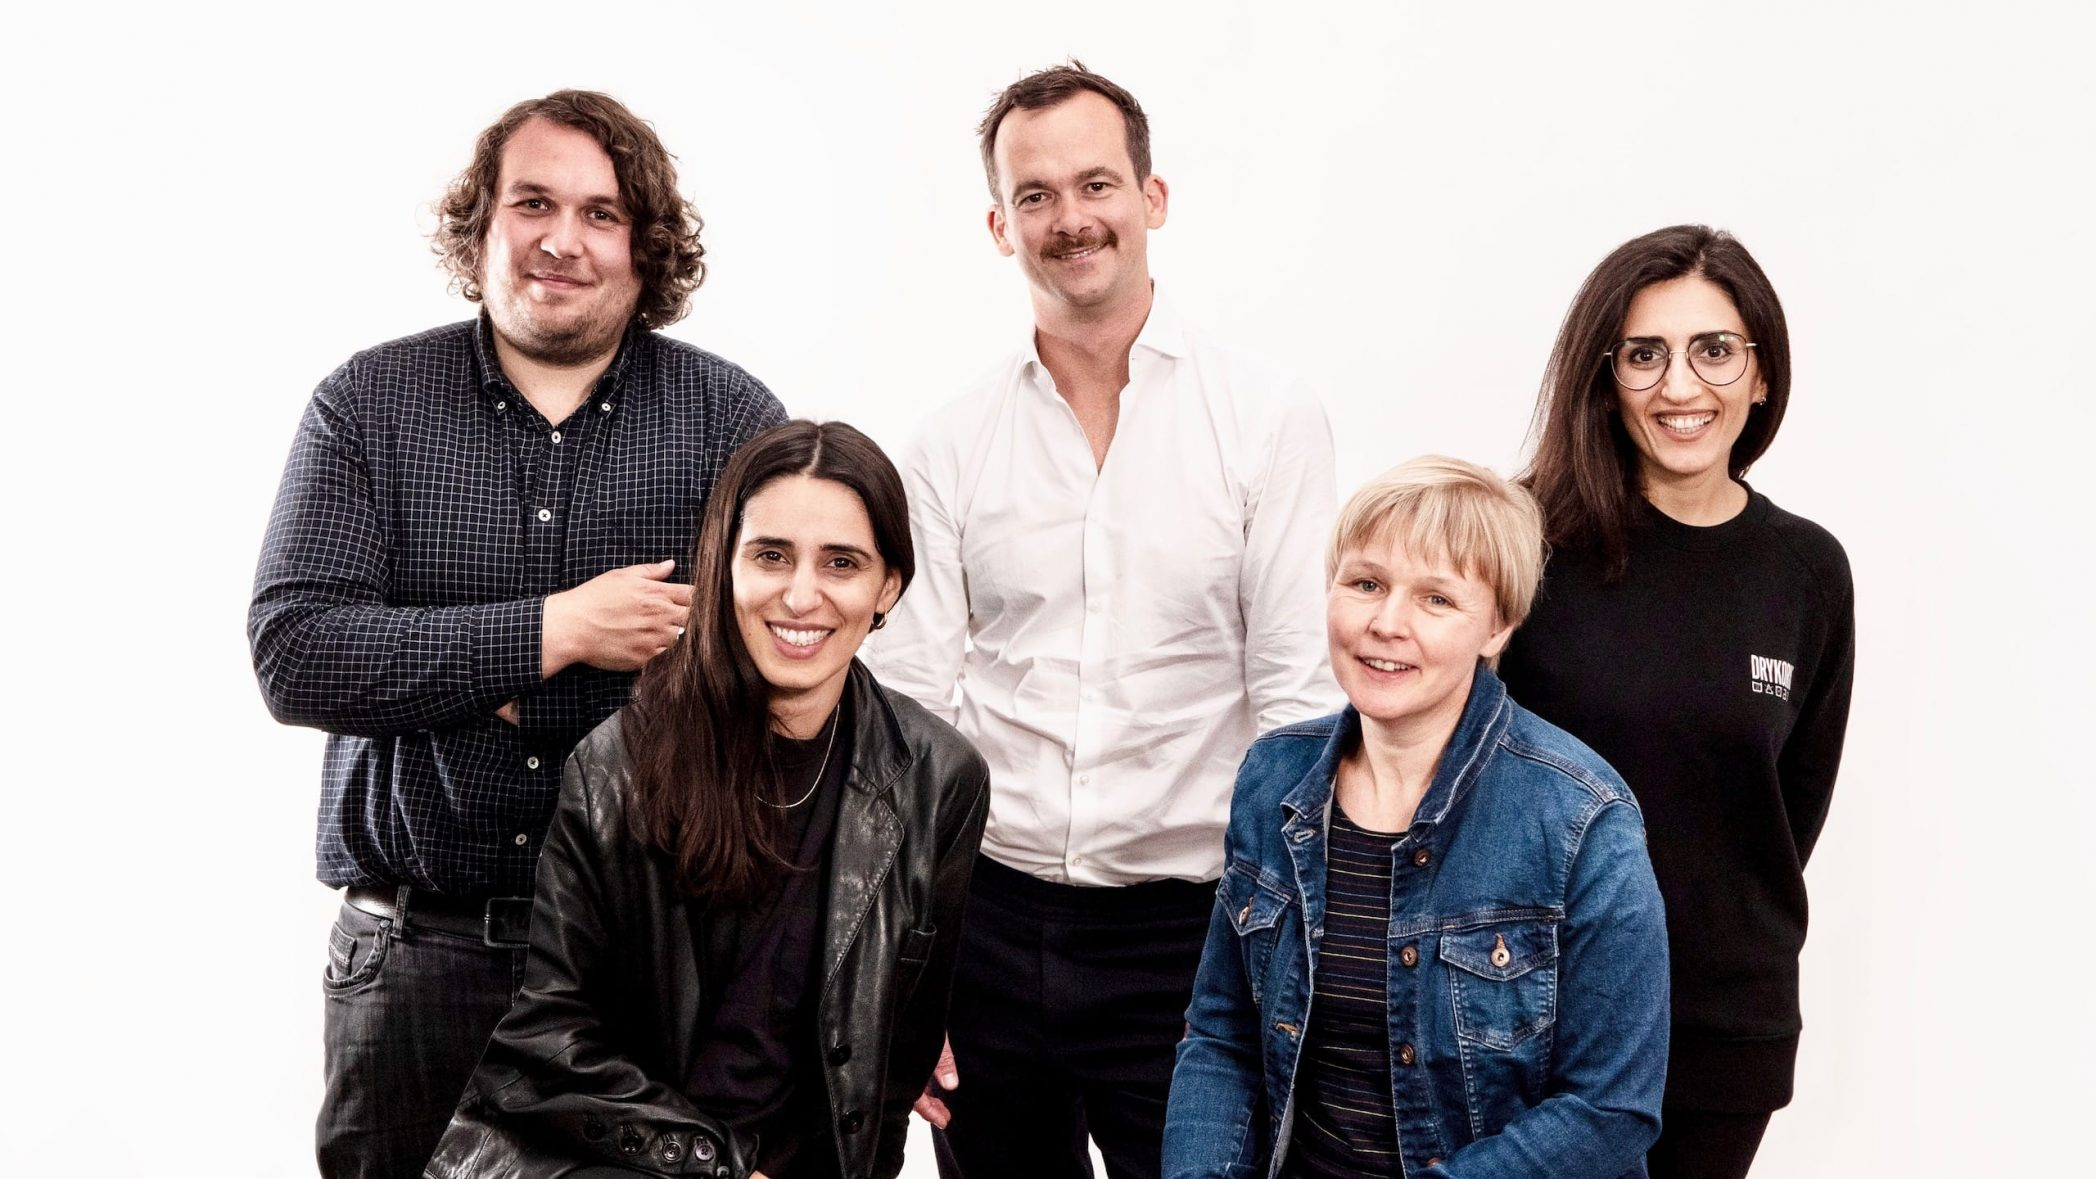 Spielfilmjury First Steps , Robert Hofmann, Maryam Zaree, Jonas Dornbach, Daniela Knapp, Soleen Yusef, Frank Nagel